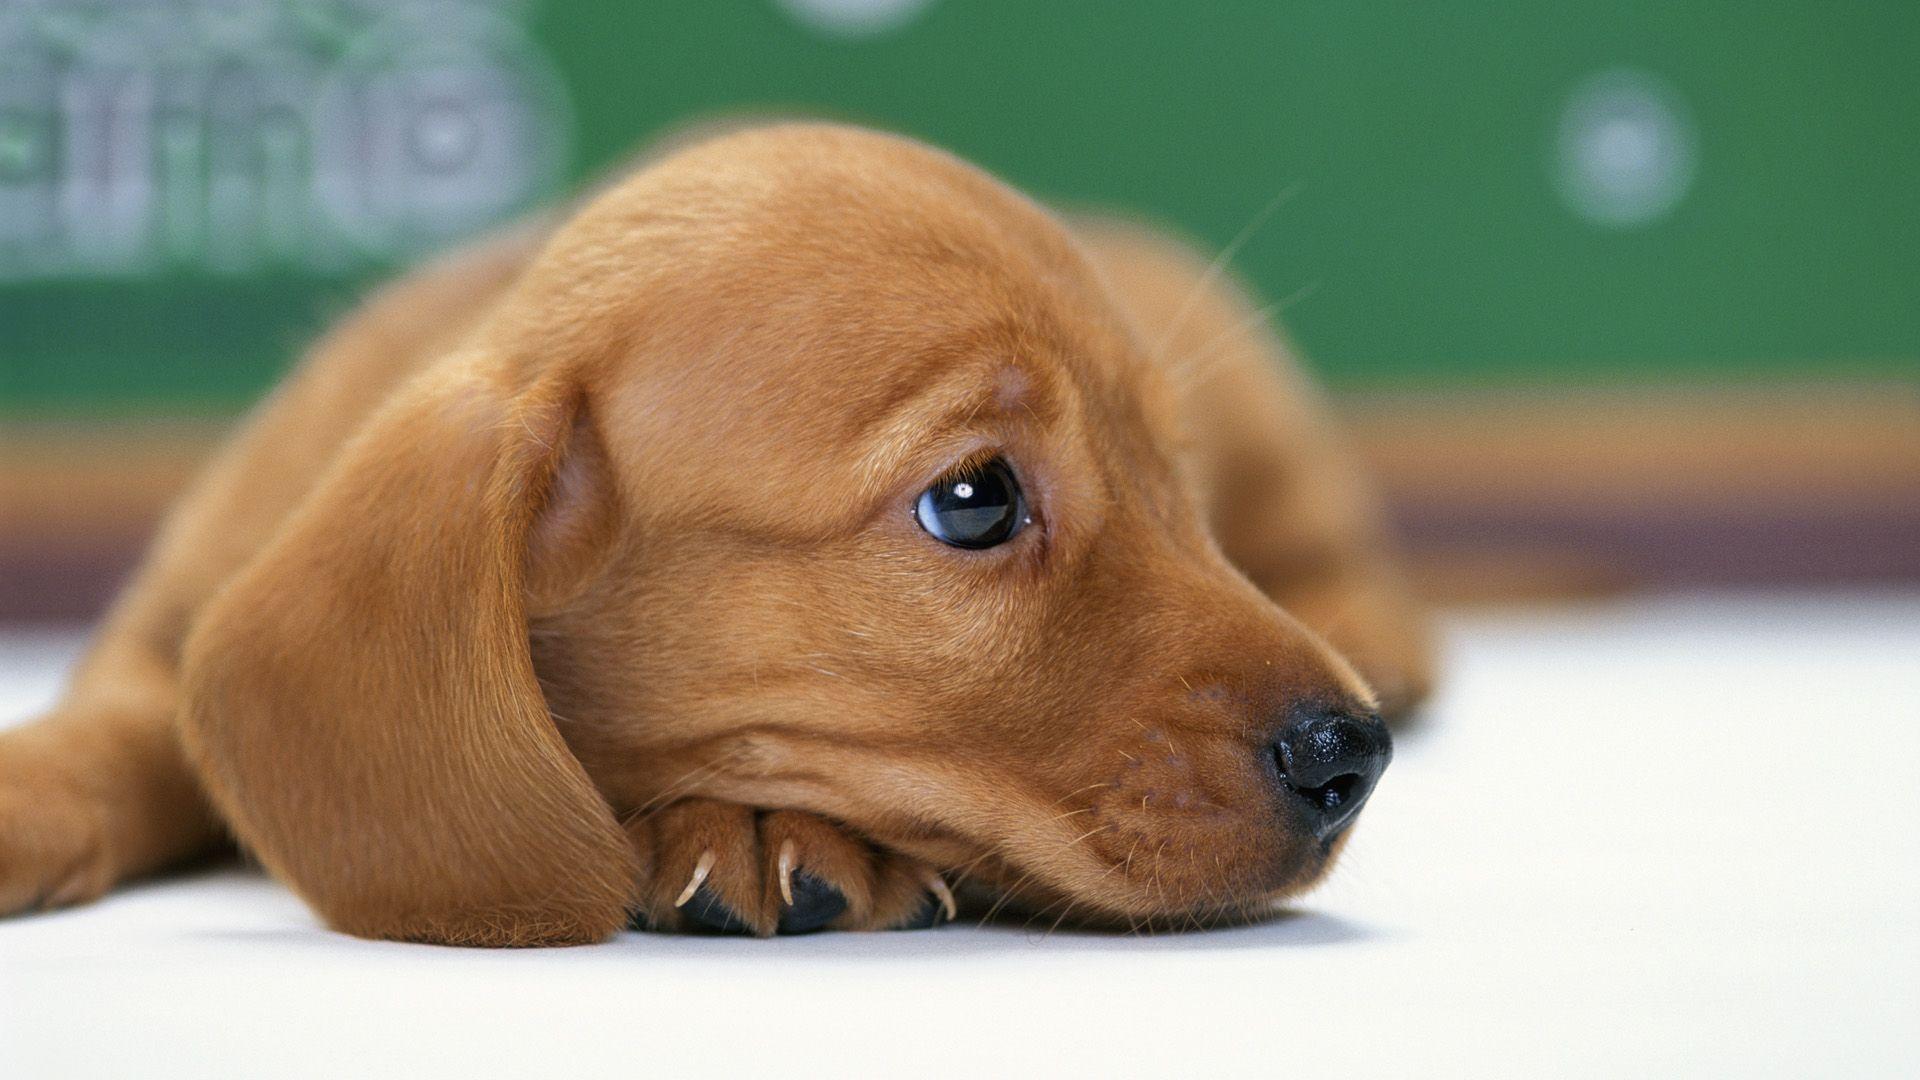 Miniature Dachshund Puppy Cute Cats Dogs Dachshund Dog